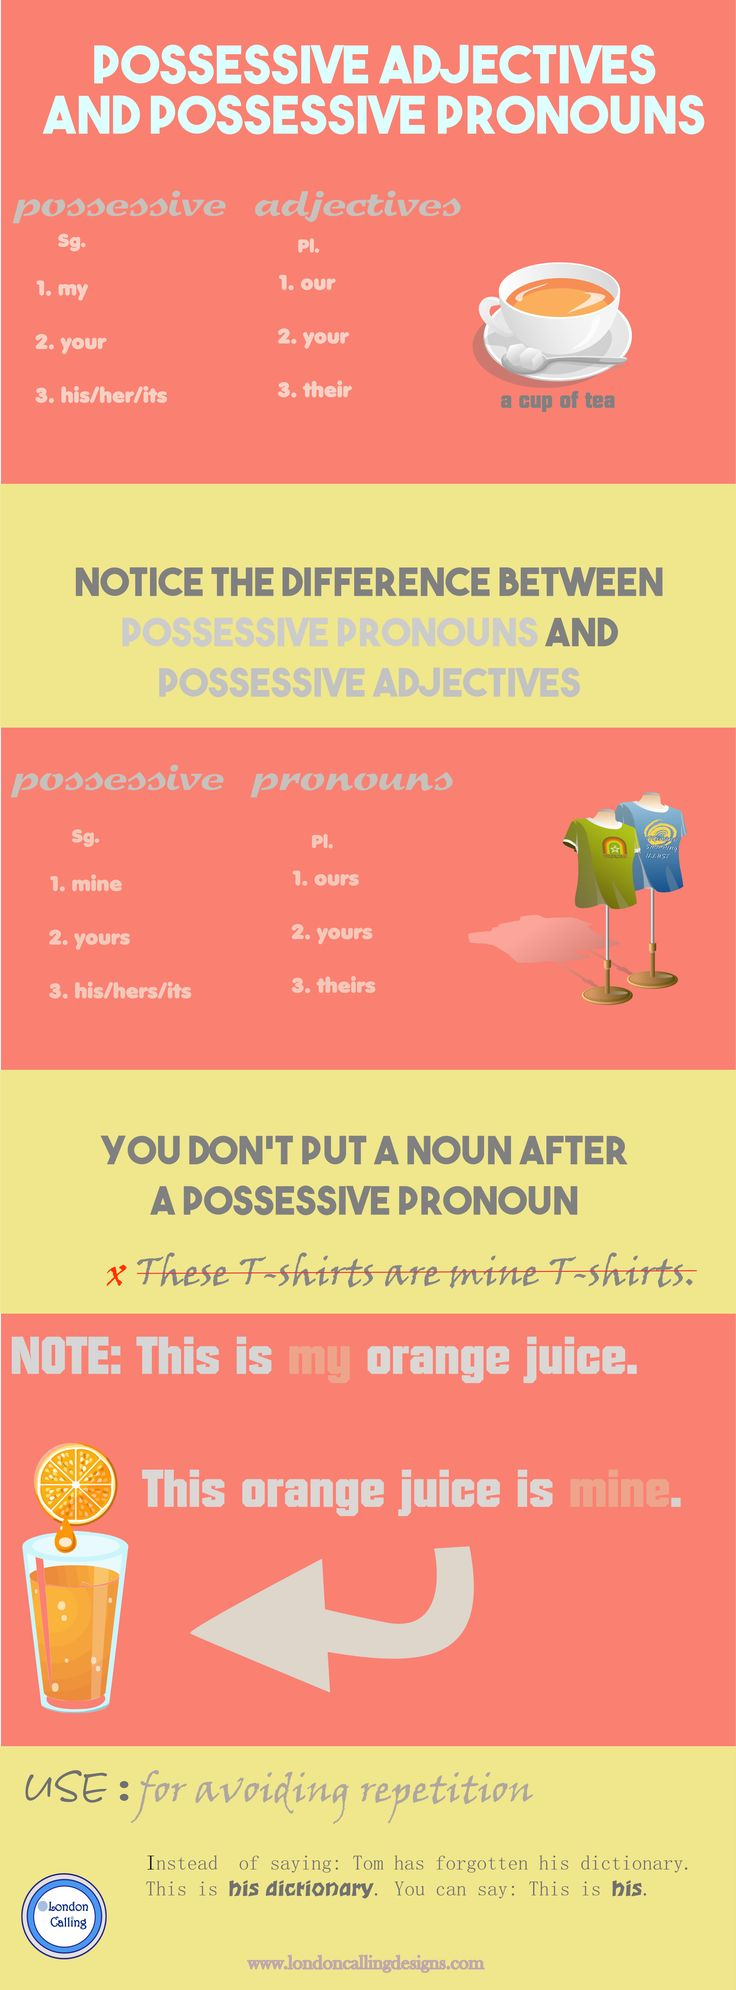 Possessive Adjectives and Possessive Pronouns - London Calling Designs